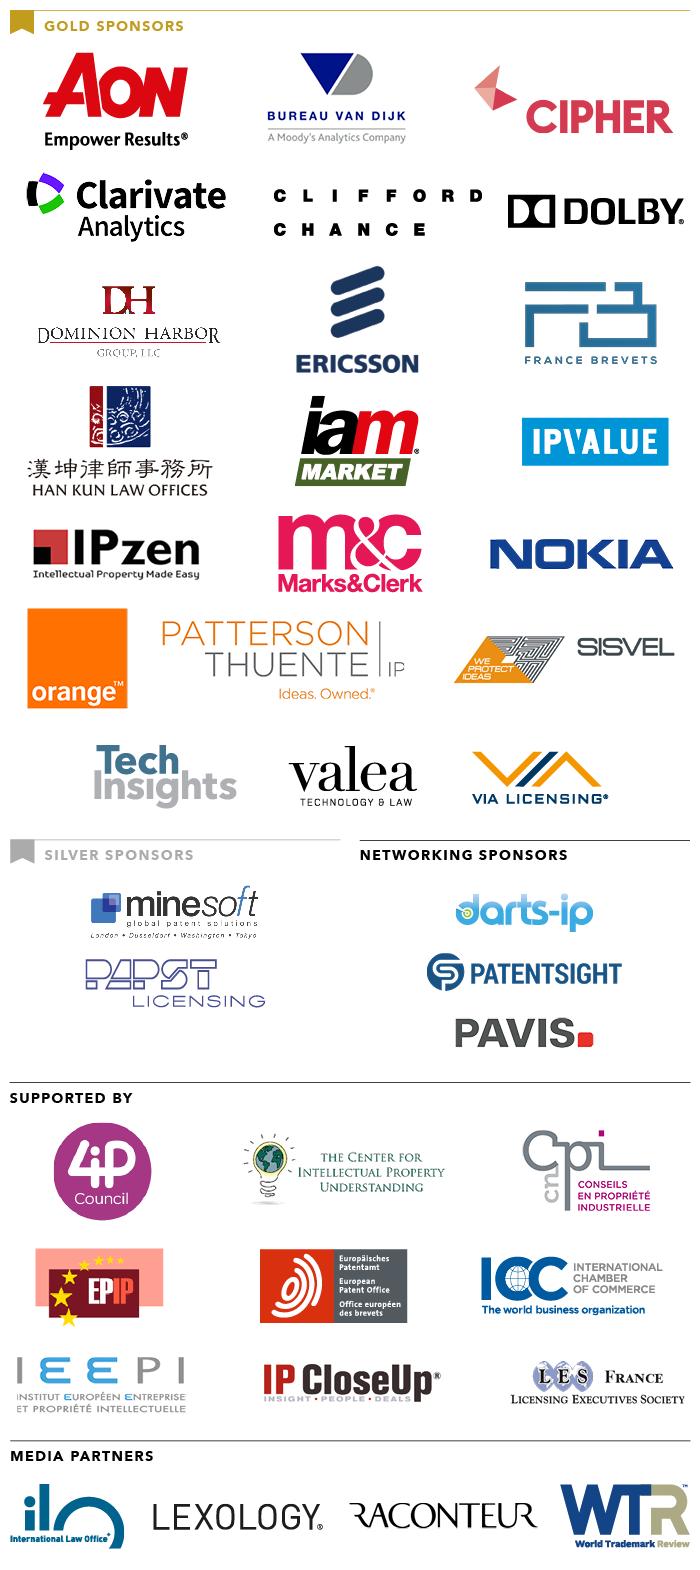 IPBC Europe 2019 Sponsor Image 07.03.19